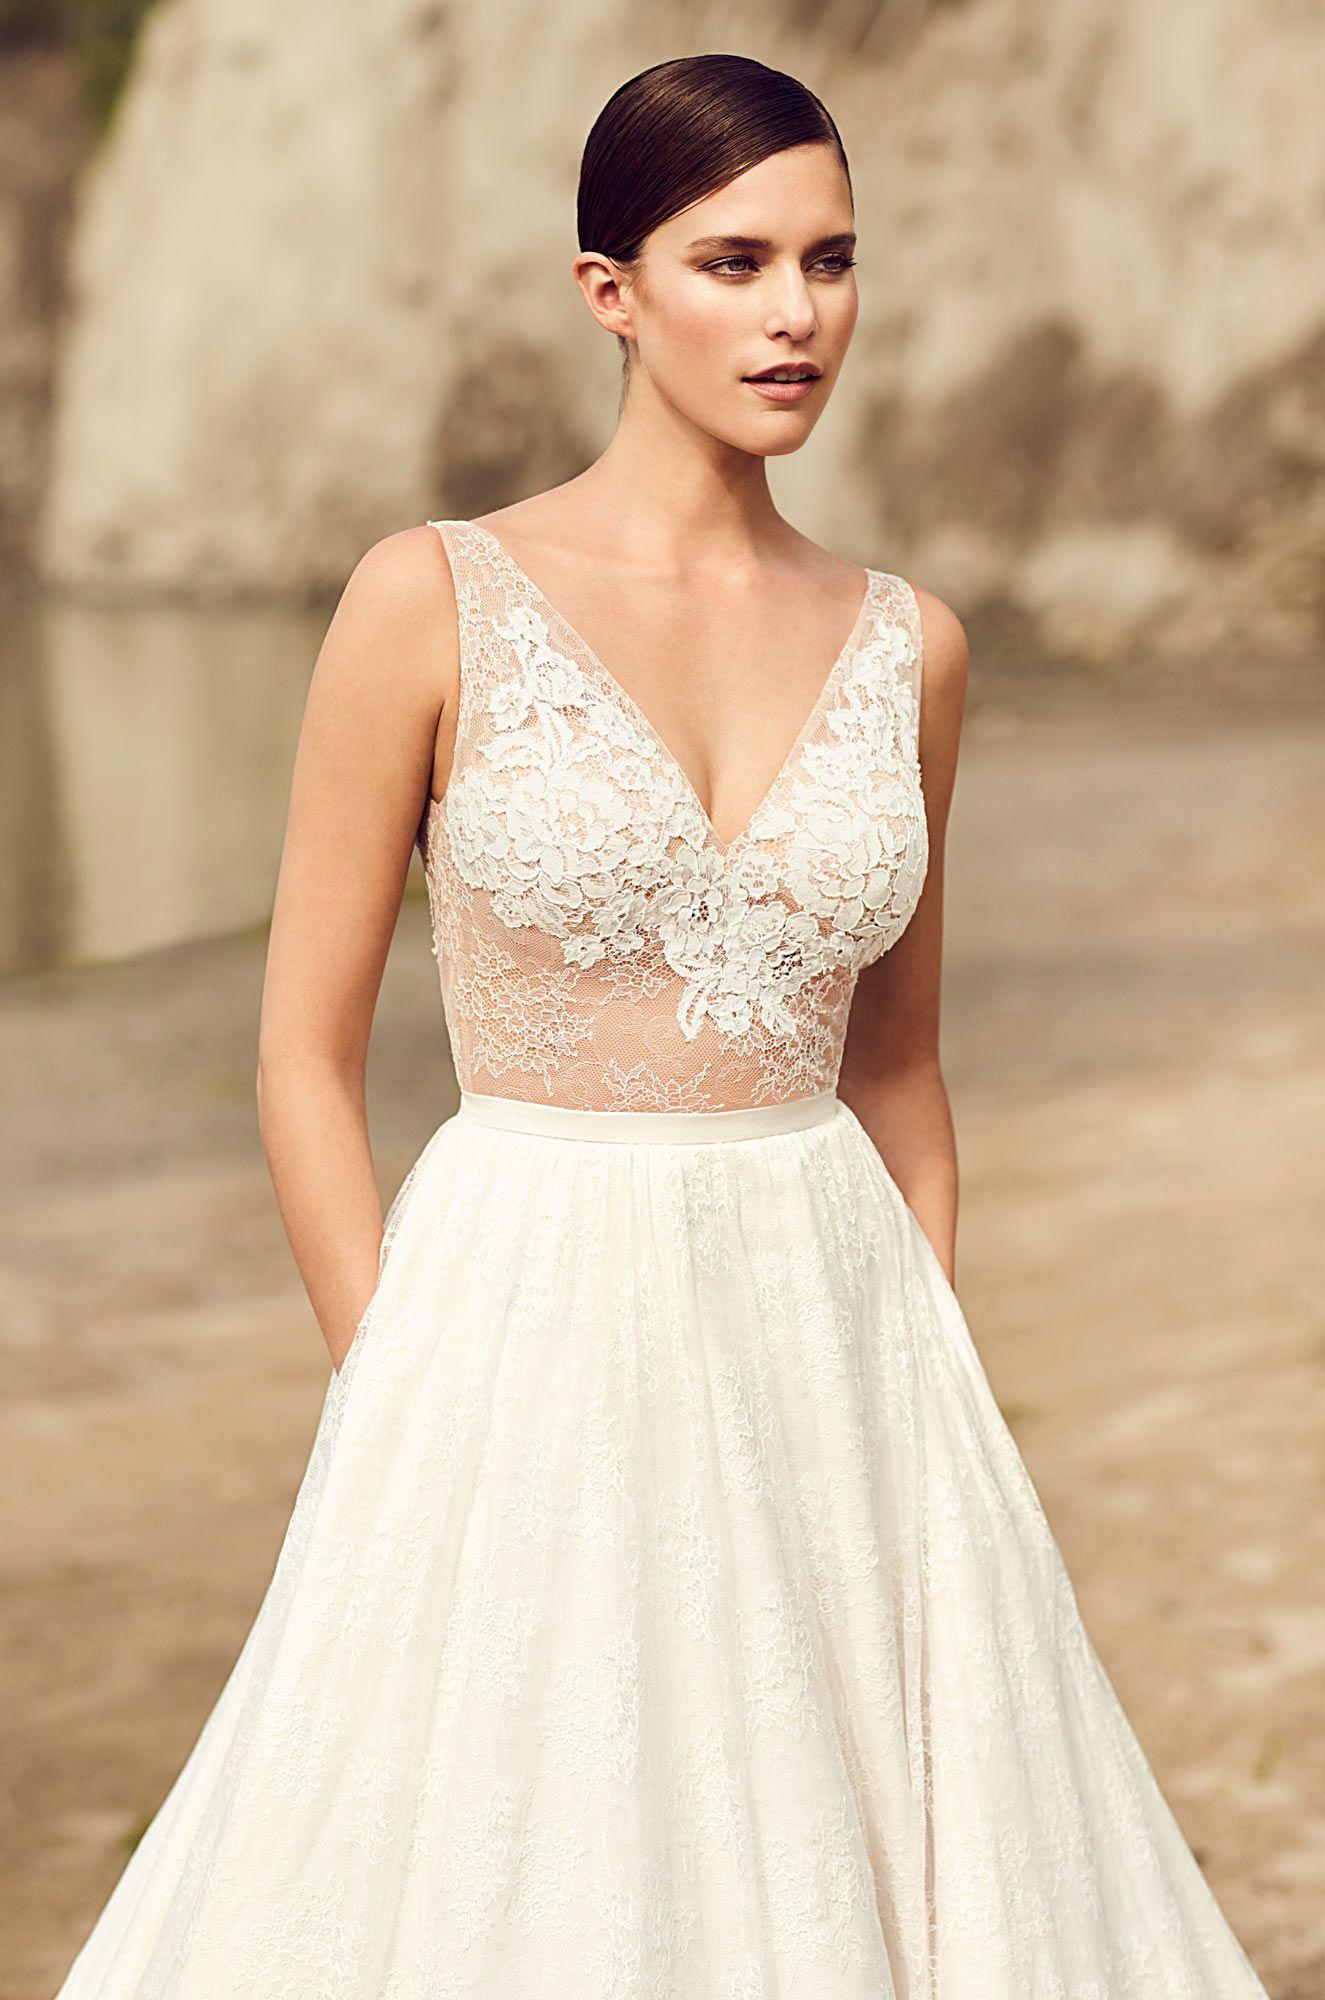 Illusion Lace Bodice Wedding Dress - Style #2114 | Mikaella bridal ...